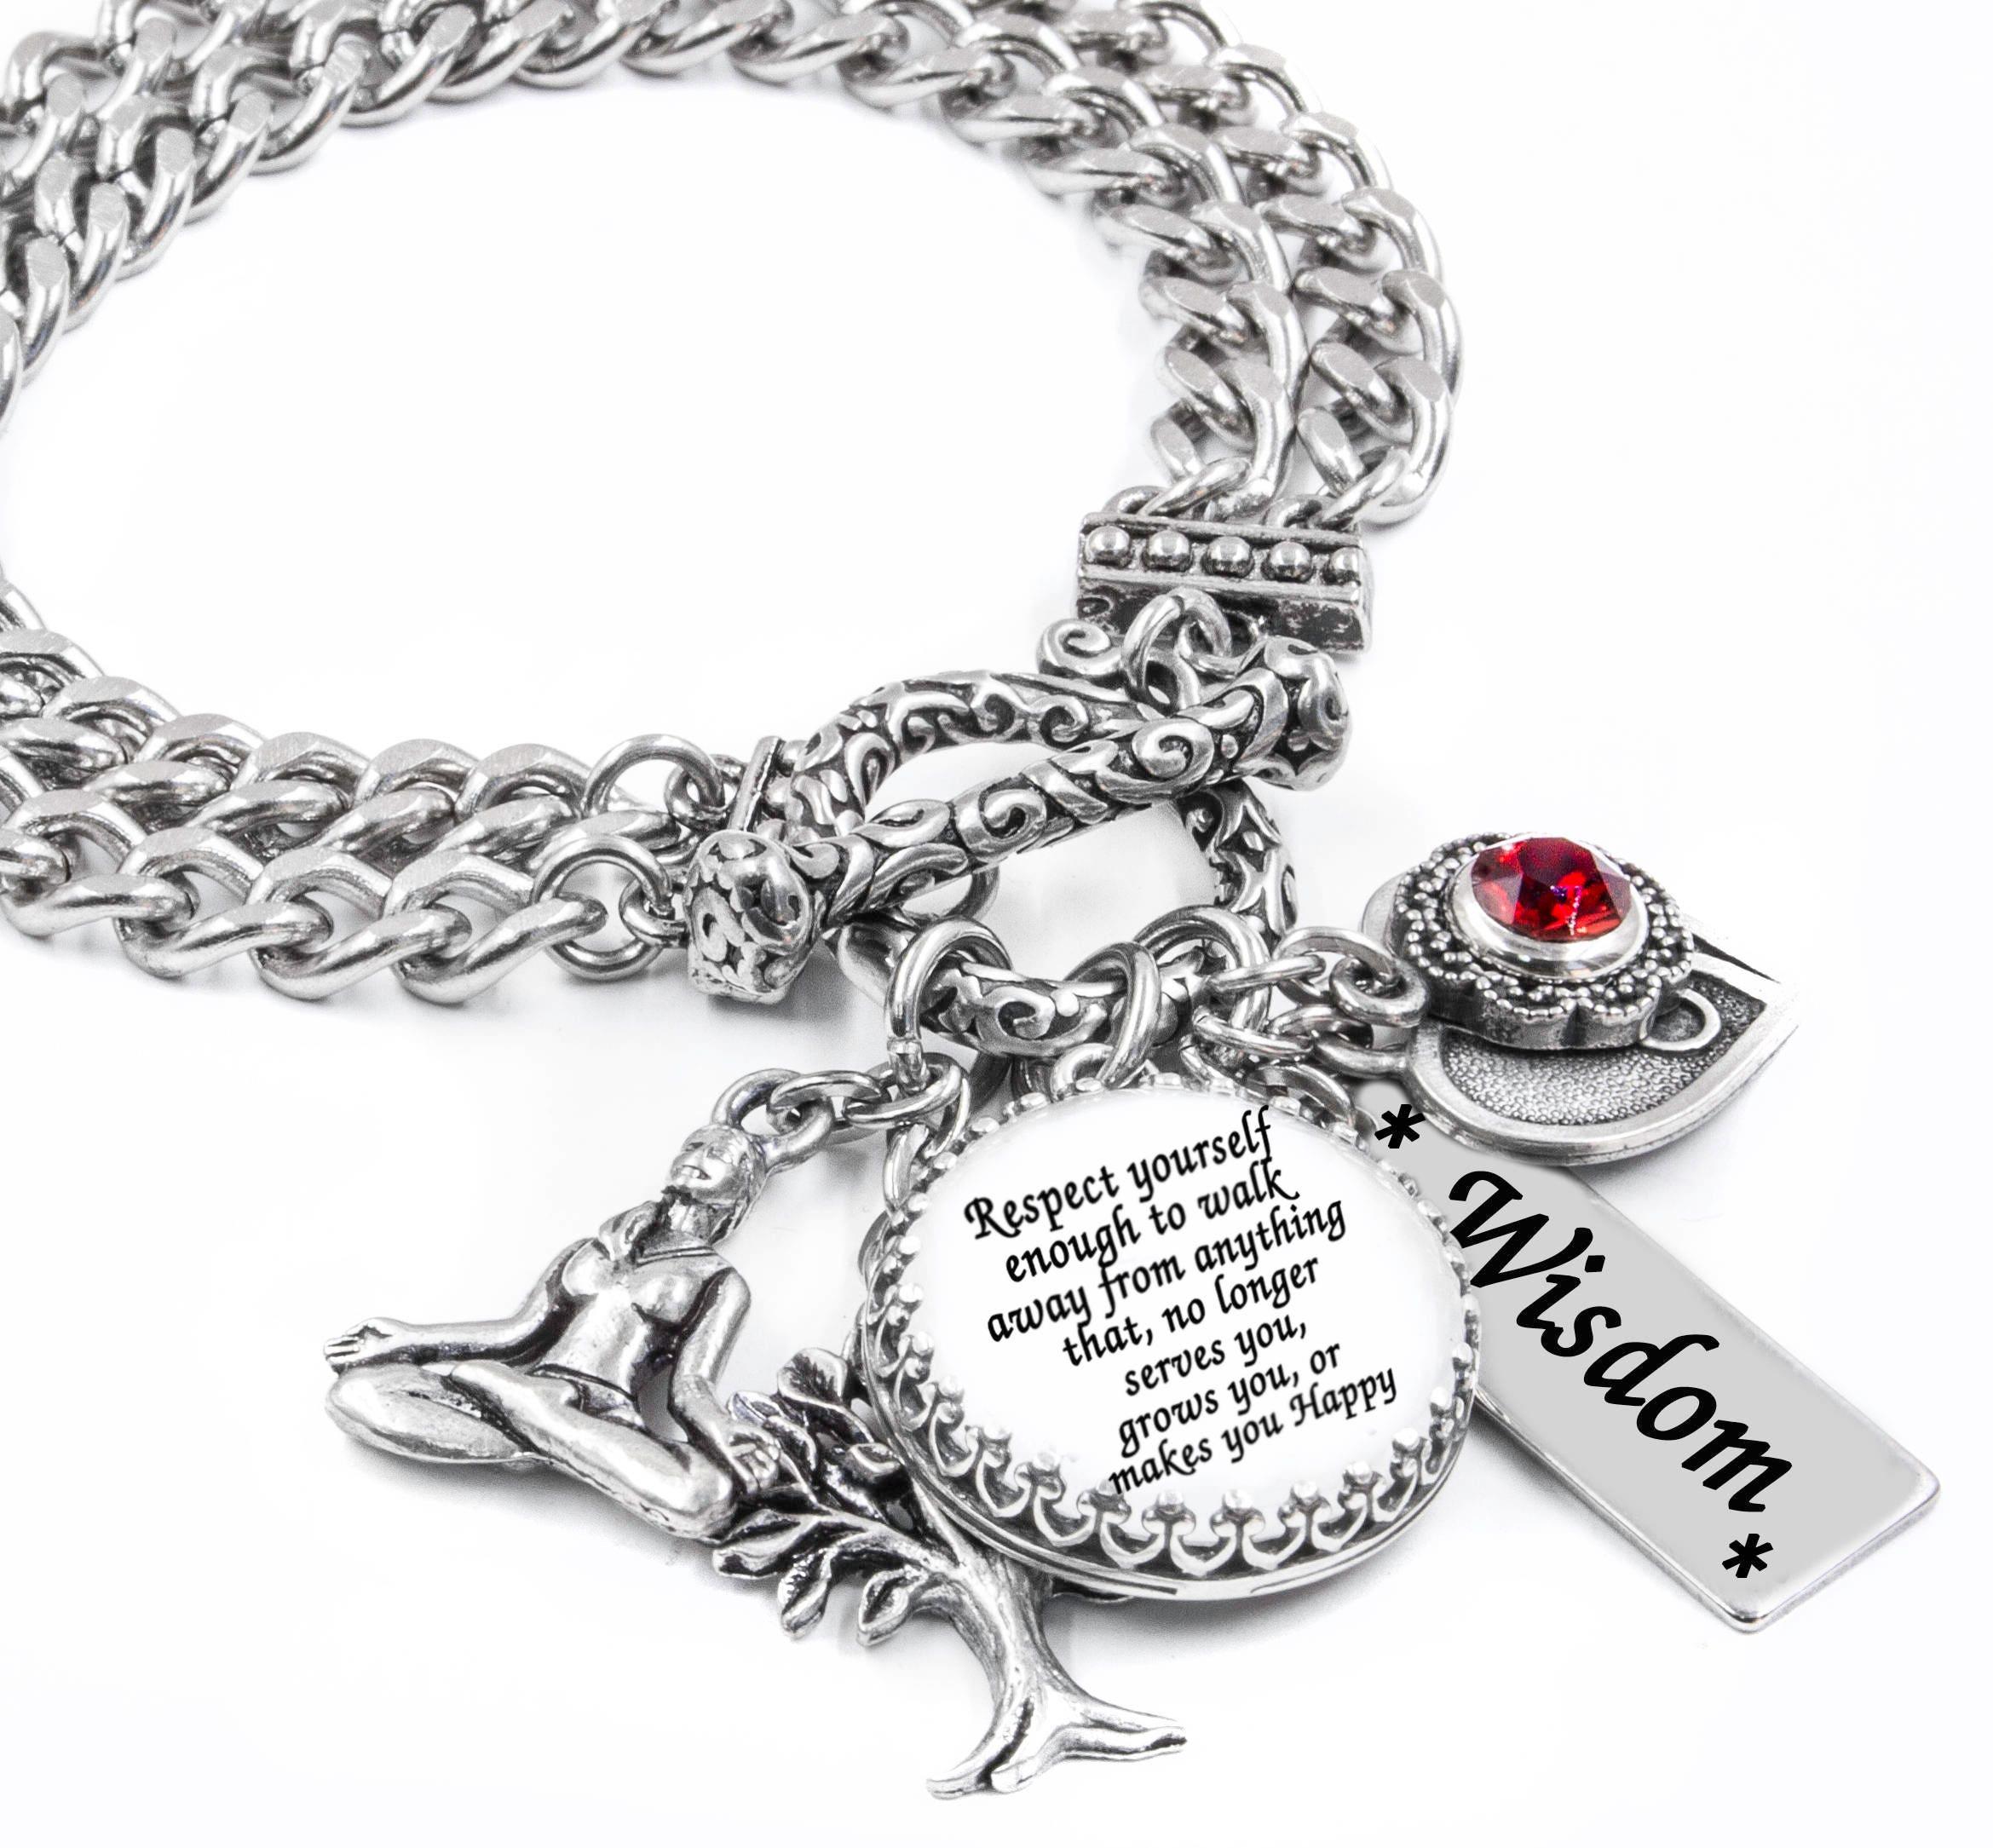 Inspirational Bracelet Silver Inspirational Jewelry